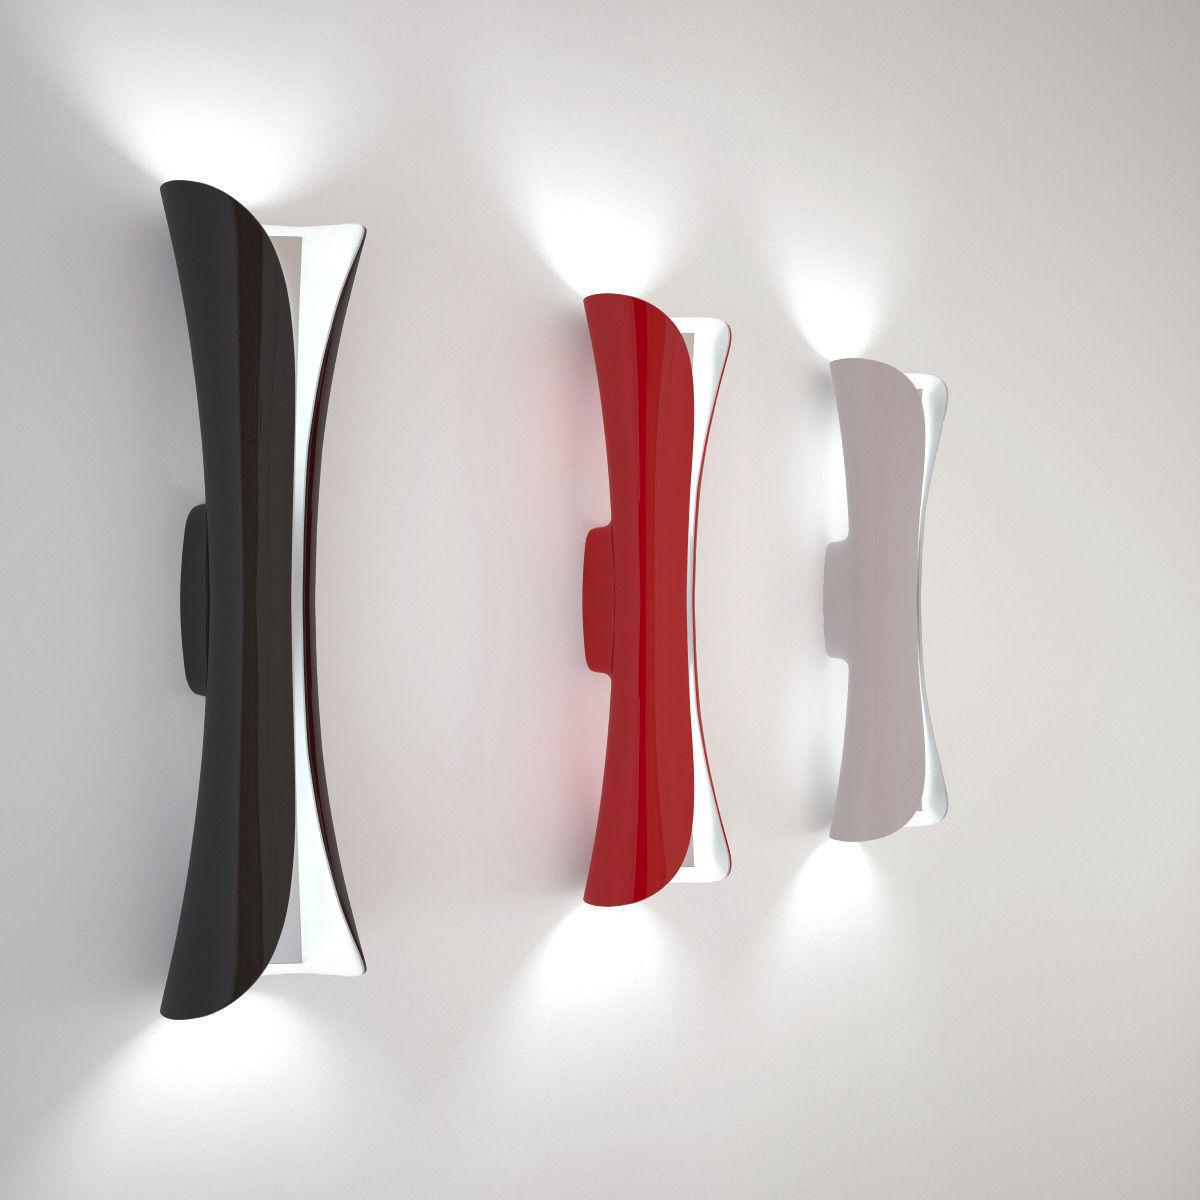 artemide cadmo parete 3d model max obj 3ds fbx mtl. Black Bedroom Furniture Sets. Home Design Ideas